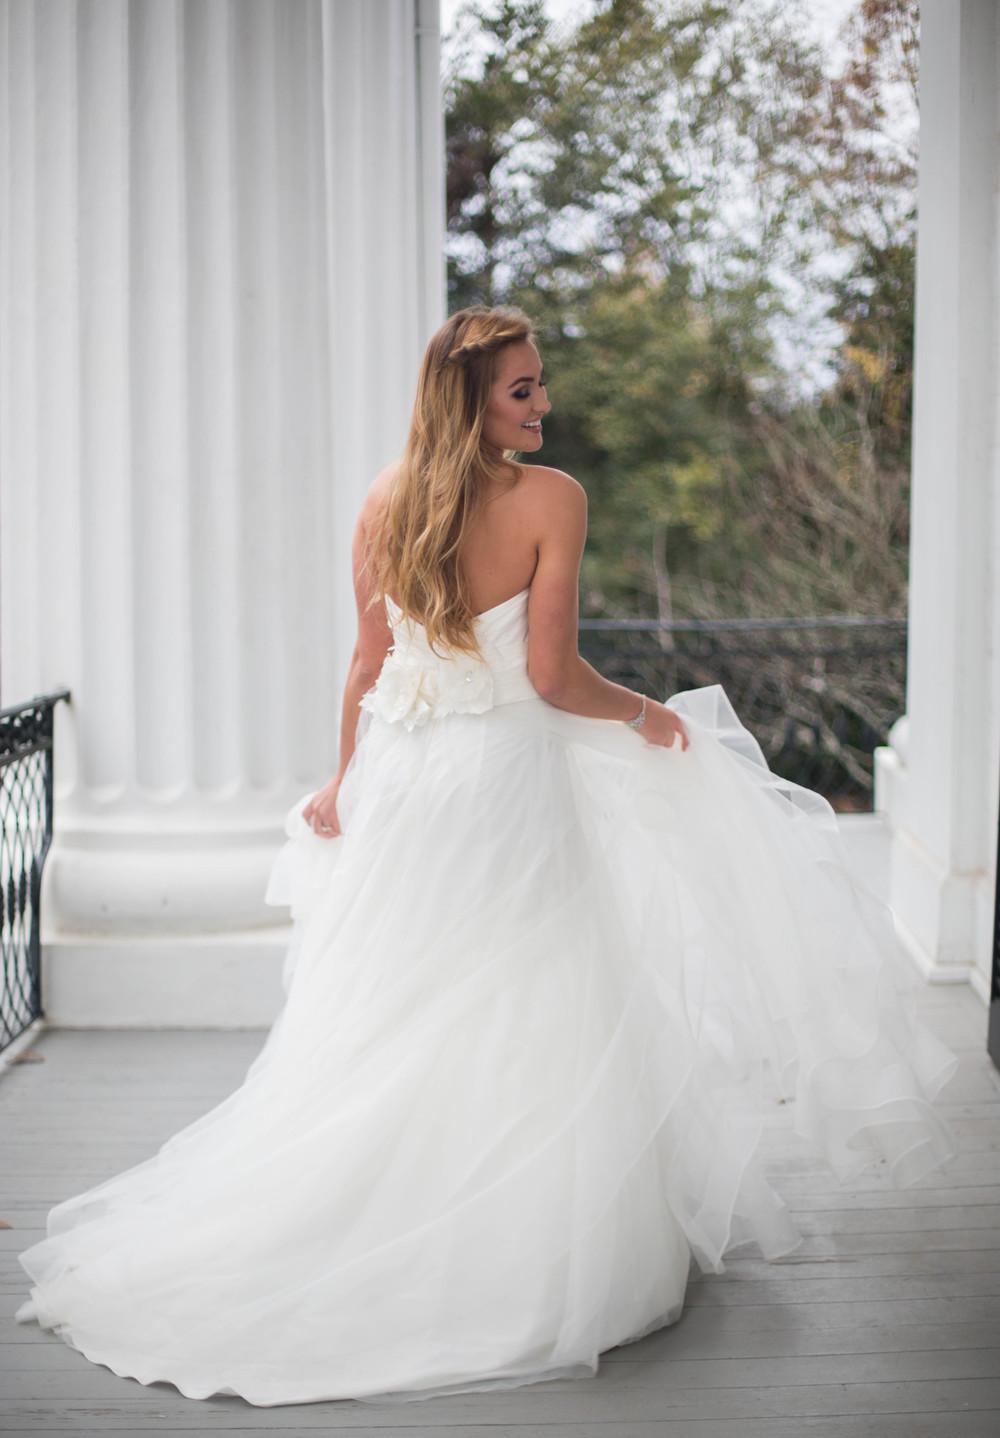 lauren bridal (89 of 123).jpg